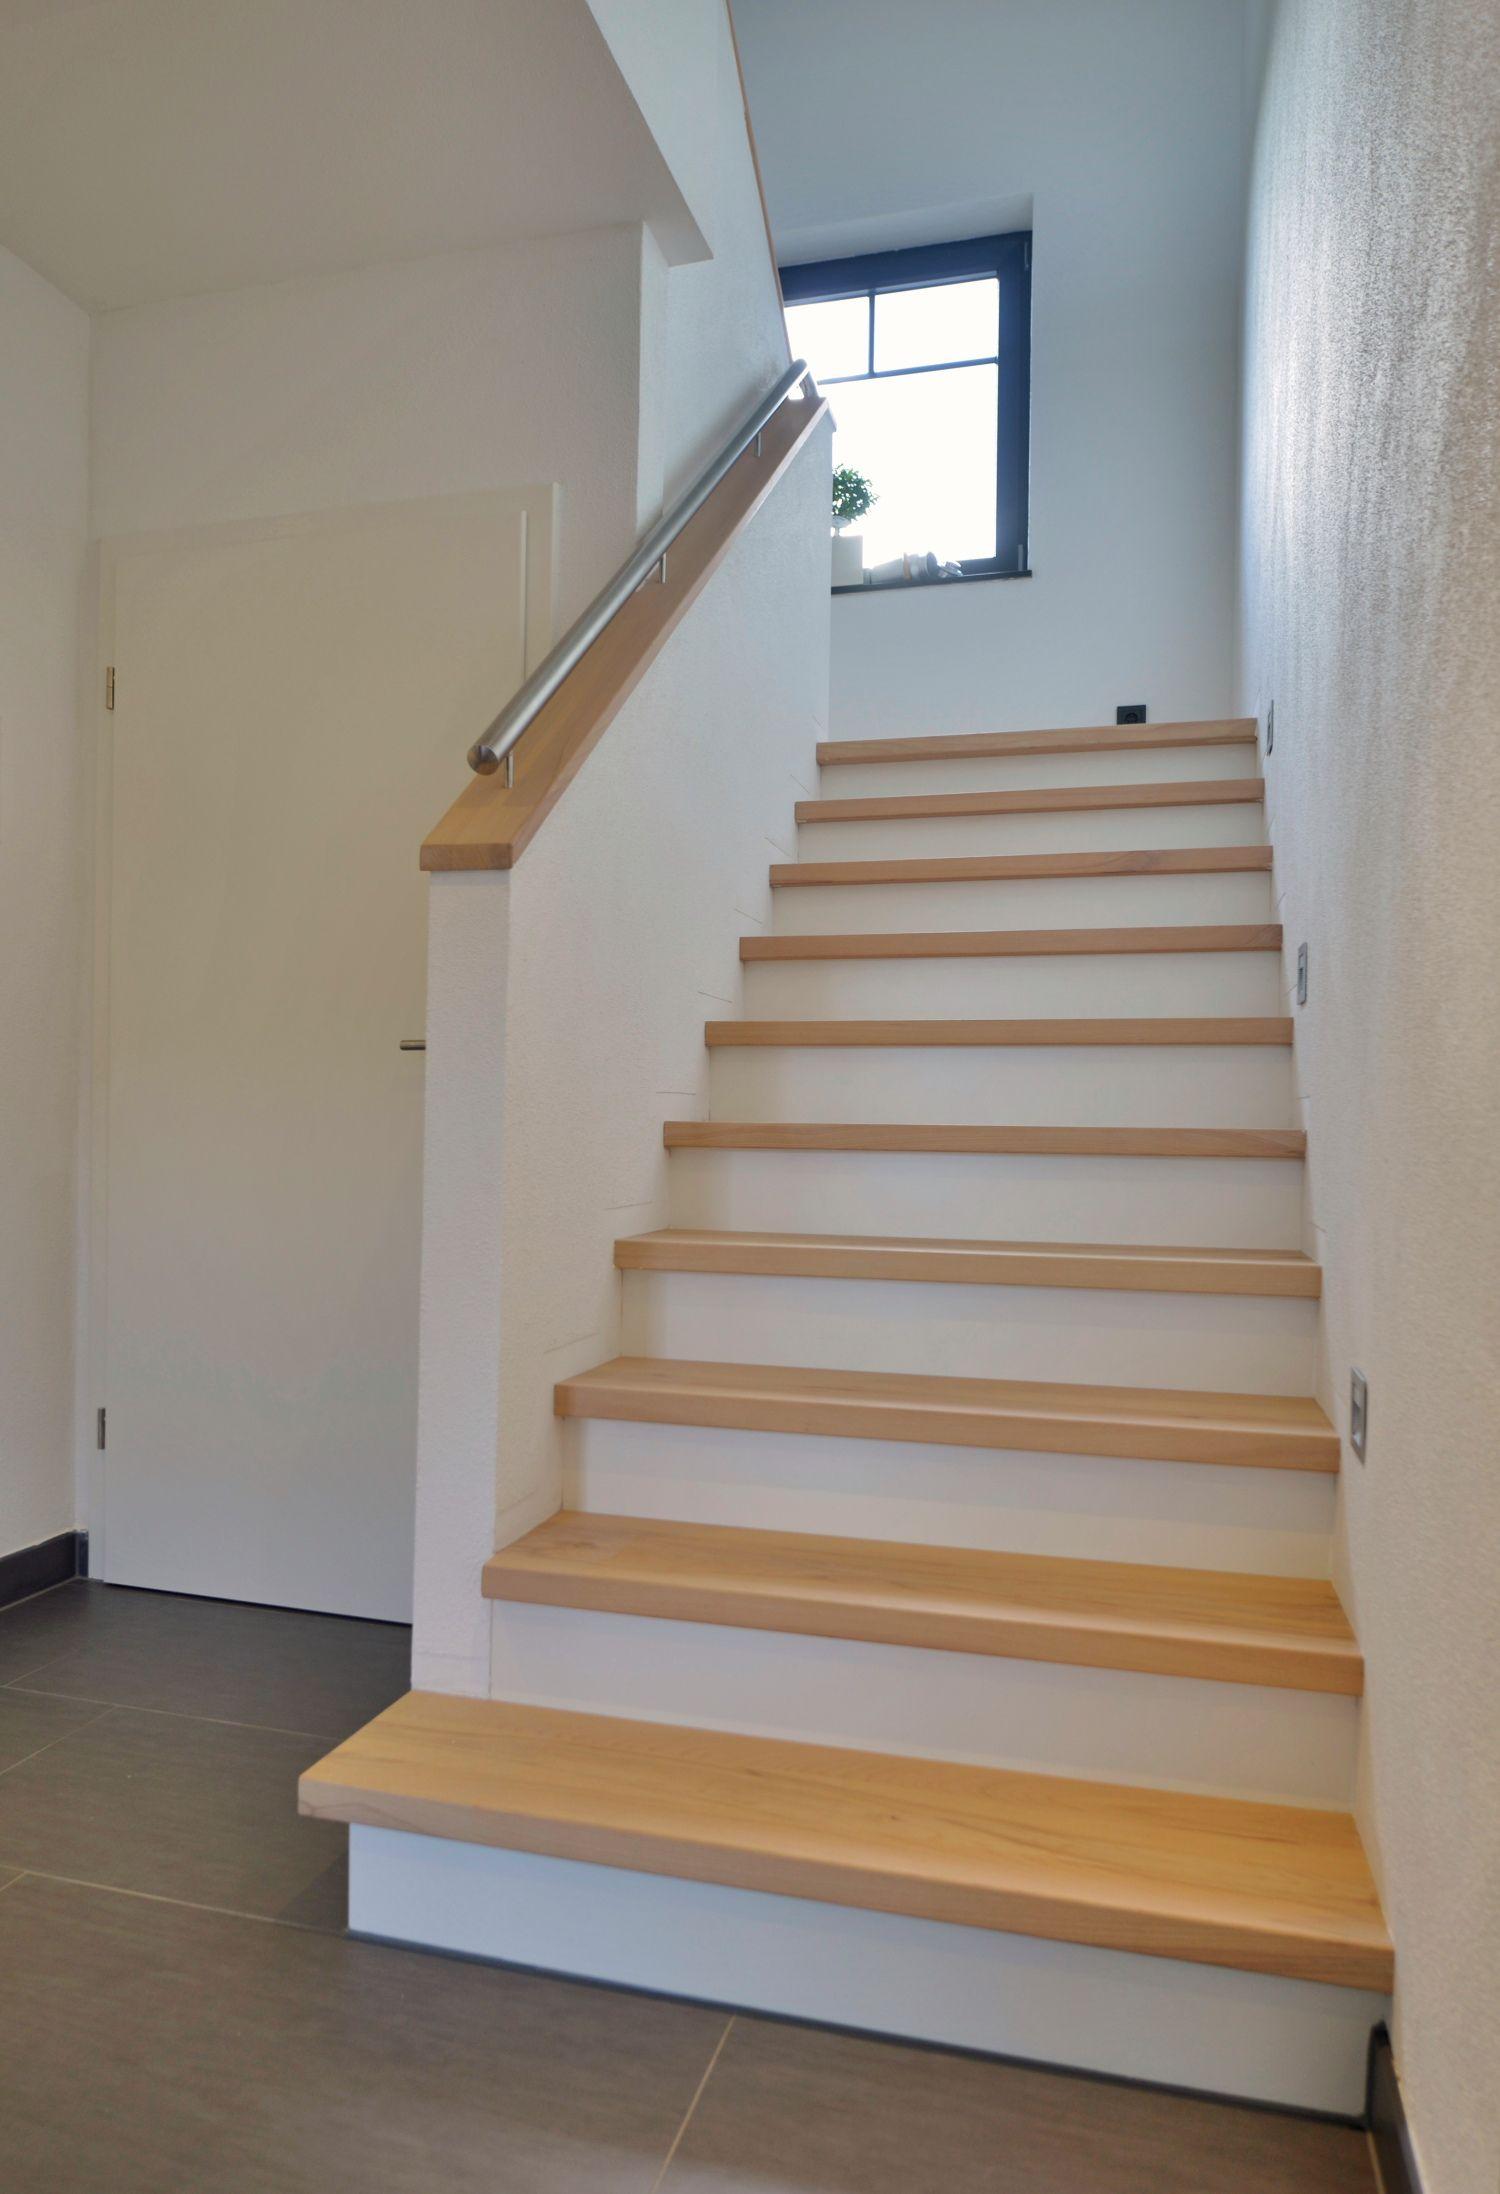 Wangentreppen Aufgesattelt Treppenbau Becker Flur In